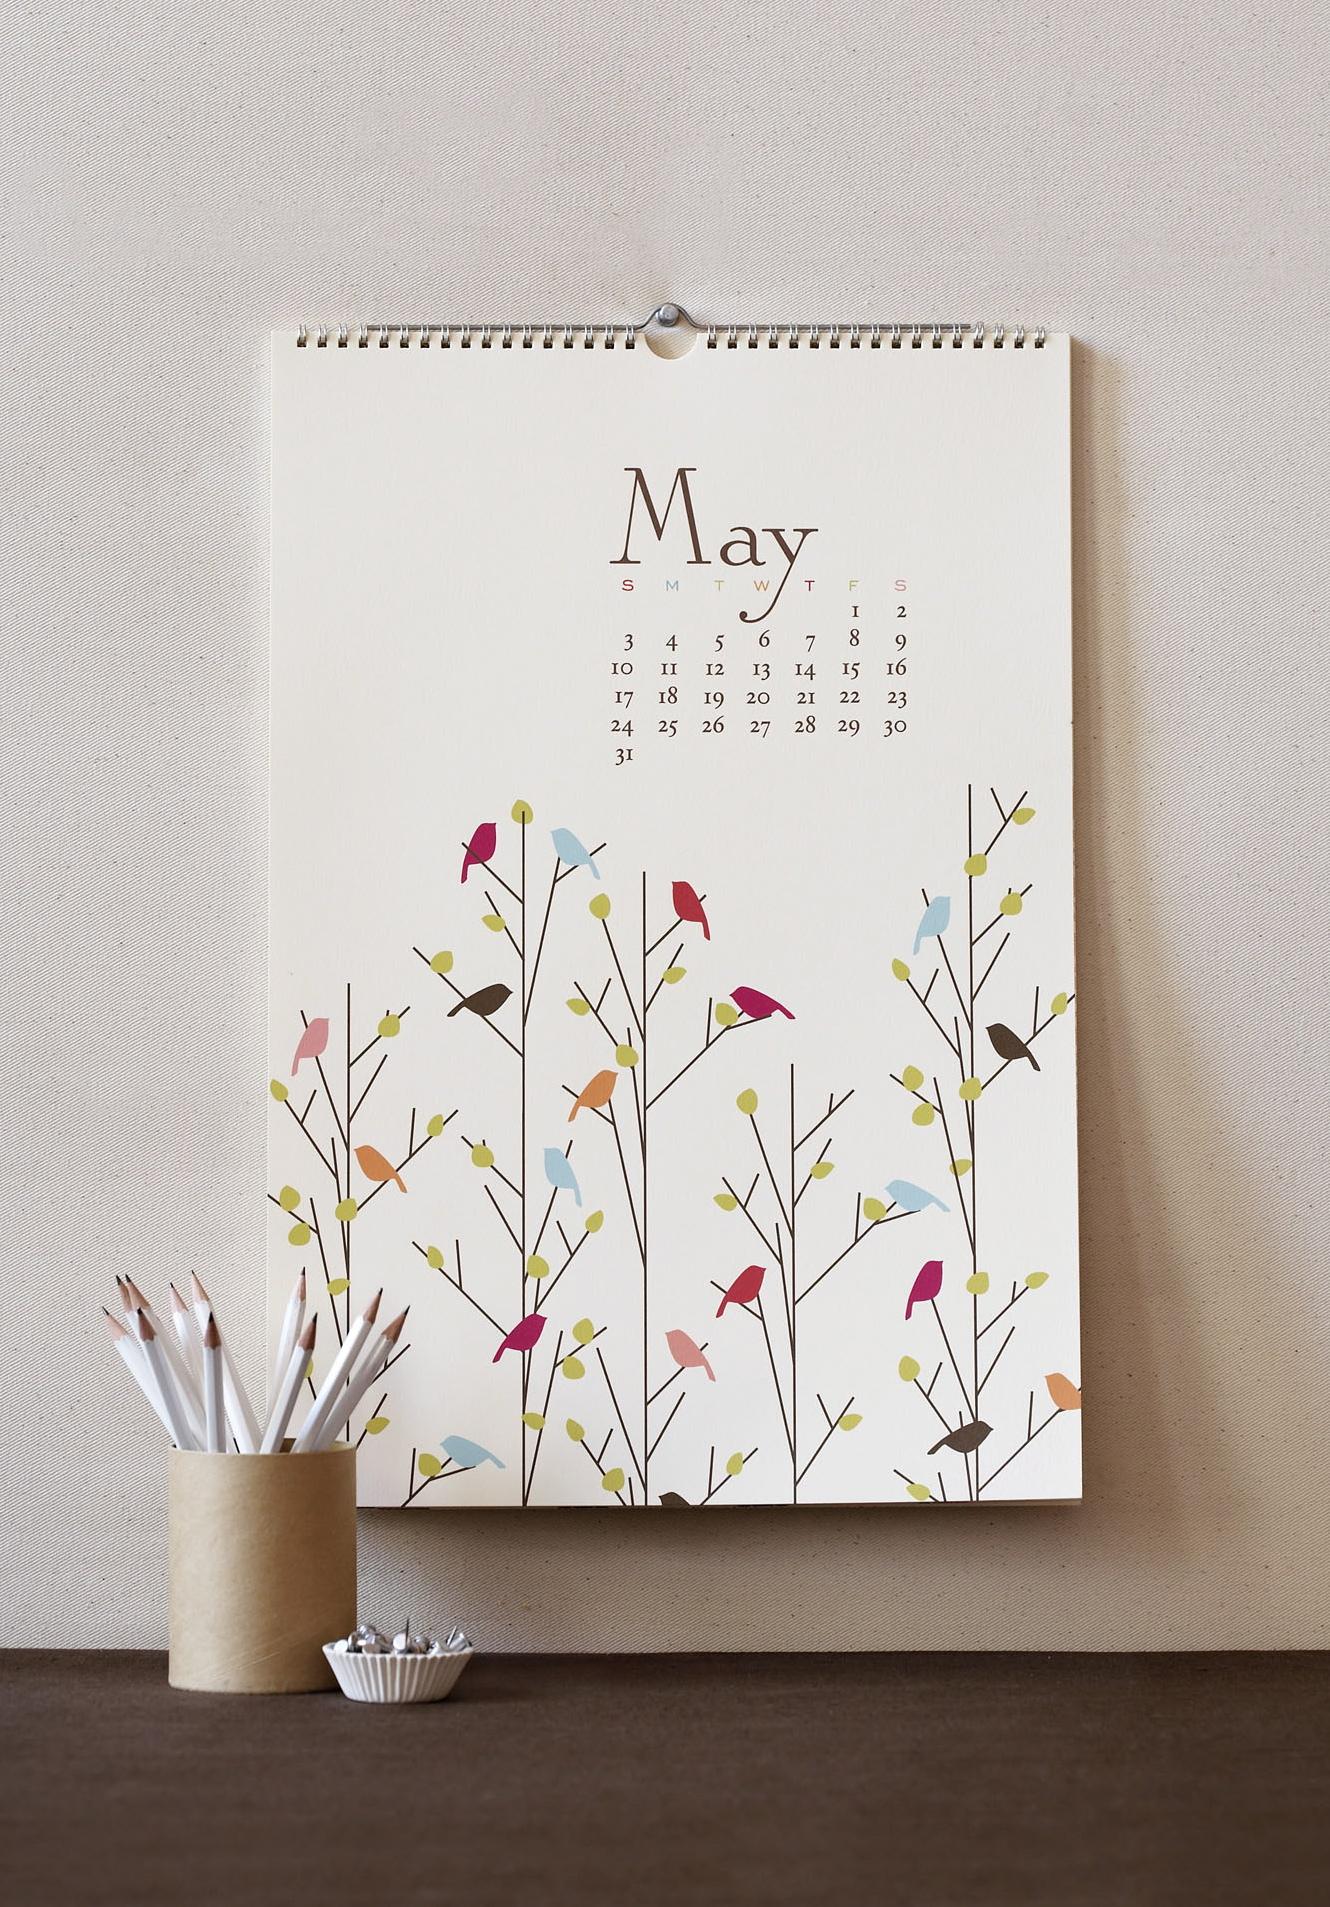 Cetak kalender 2014 Murah